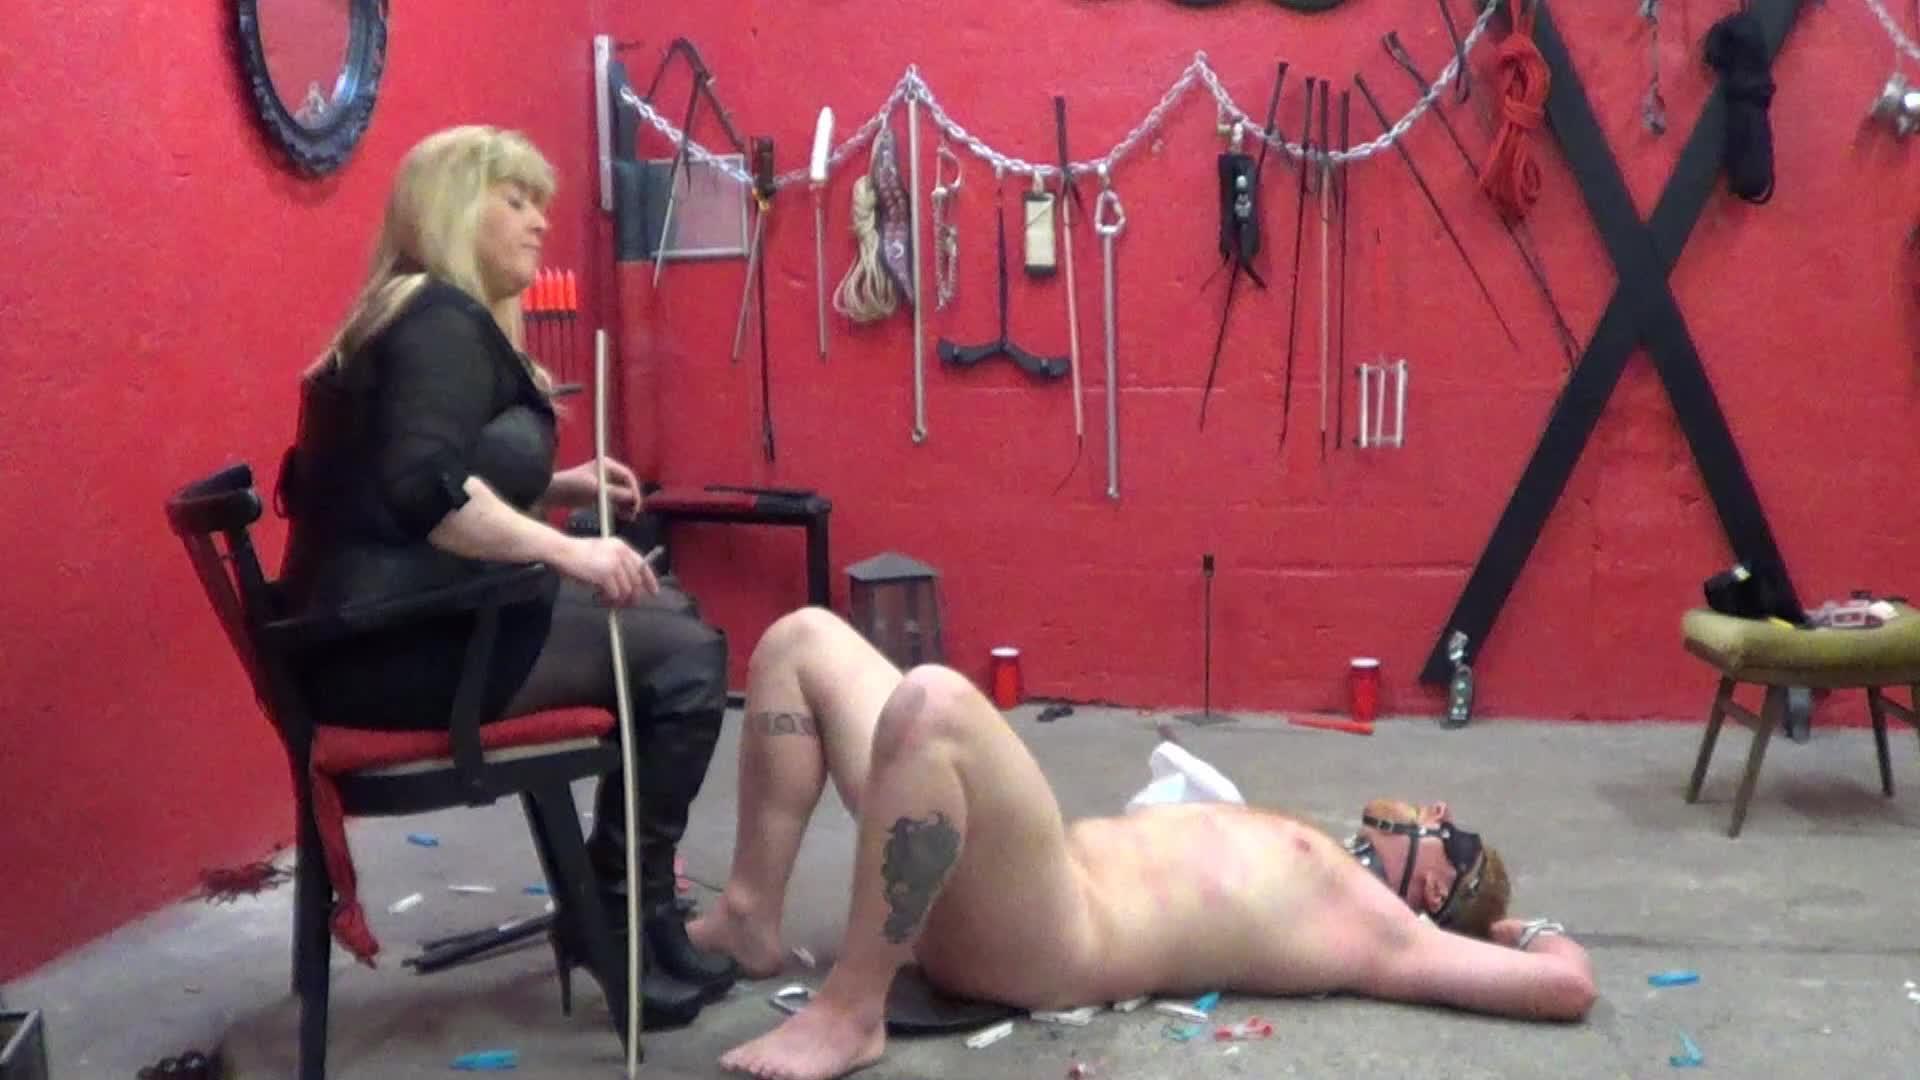 anleitung bondage